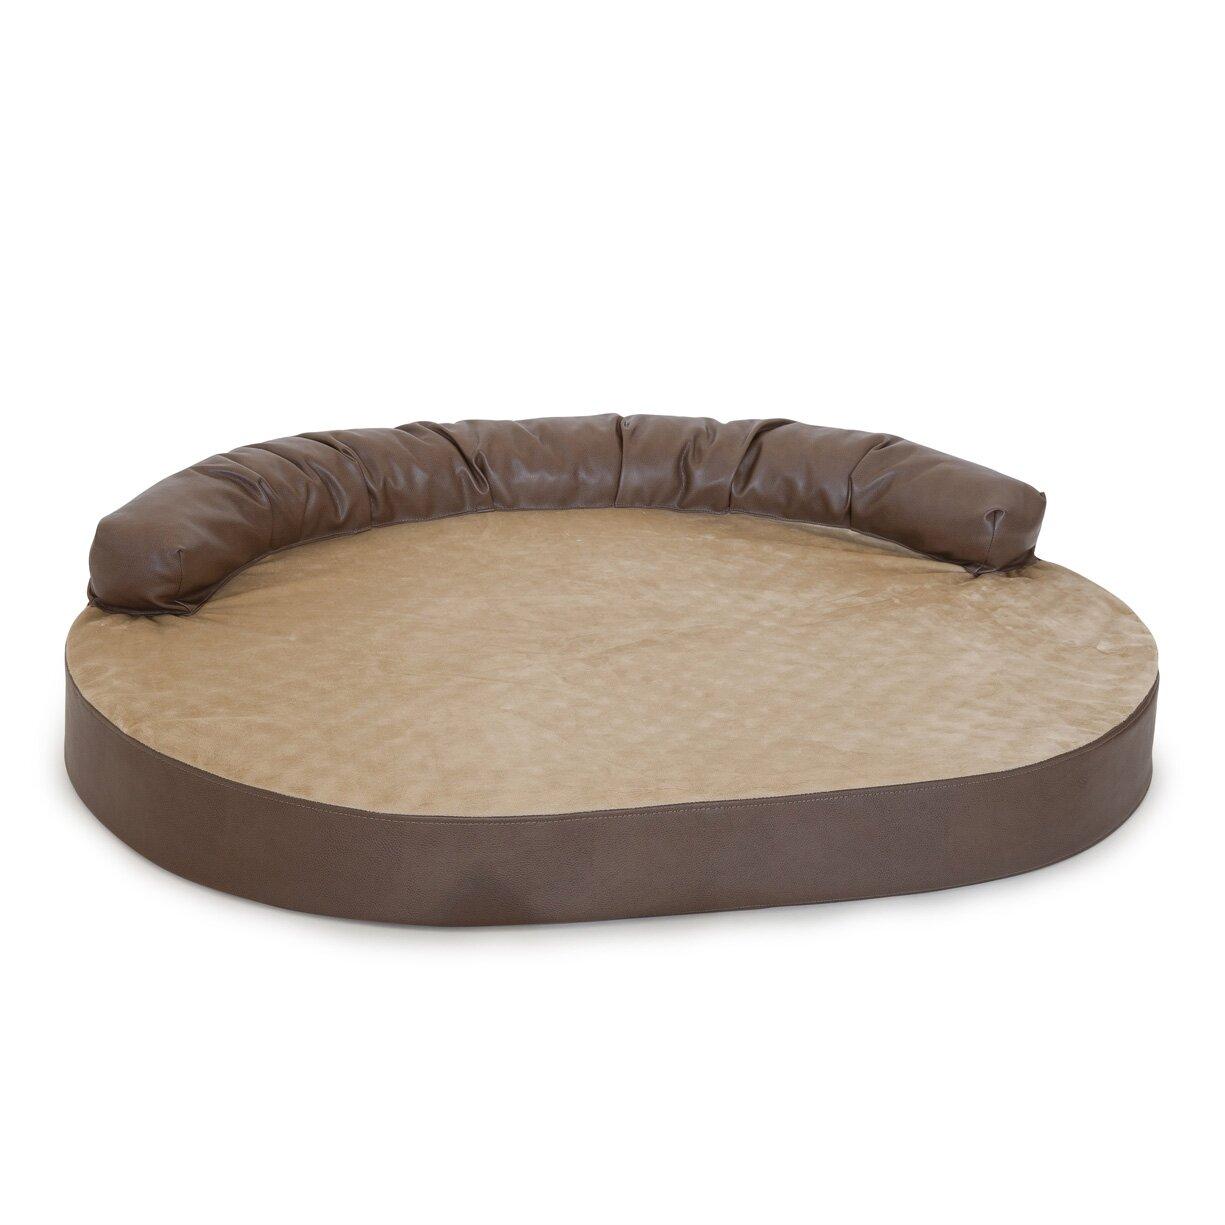 integrity bedding orthopedic memory foam leatherette joint relief bolster dog bed reviews. Black Bedroom Furniture Sets. Home Design Ideas